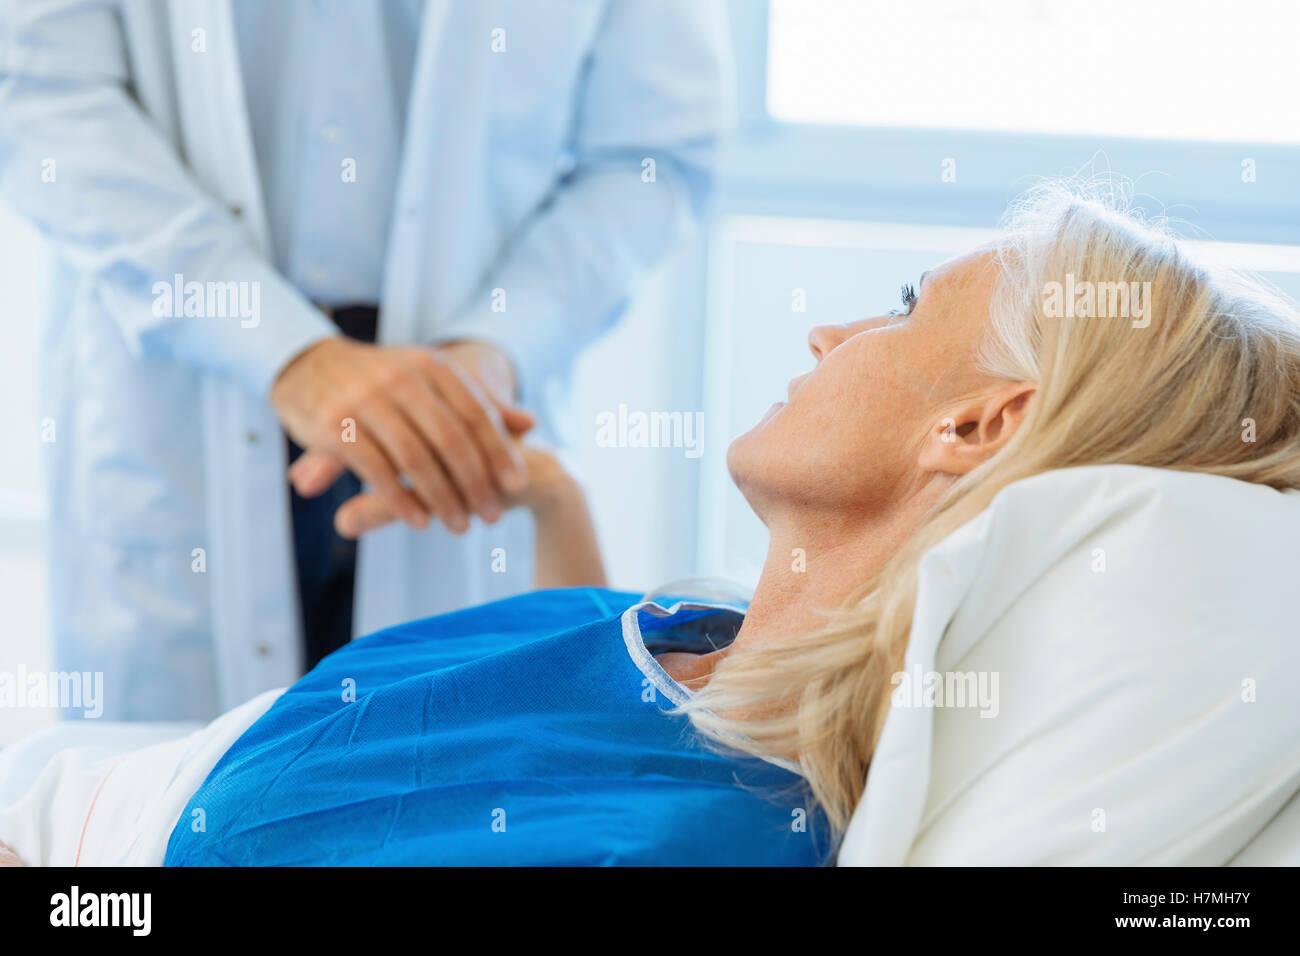 Arzt des Patienten halten Hand in Krankenzimmer Stockbild